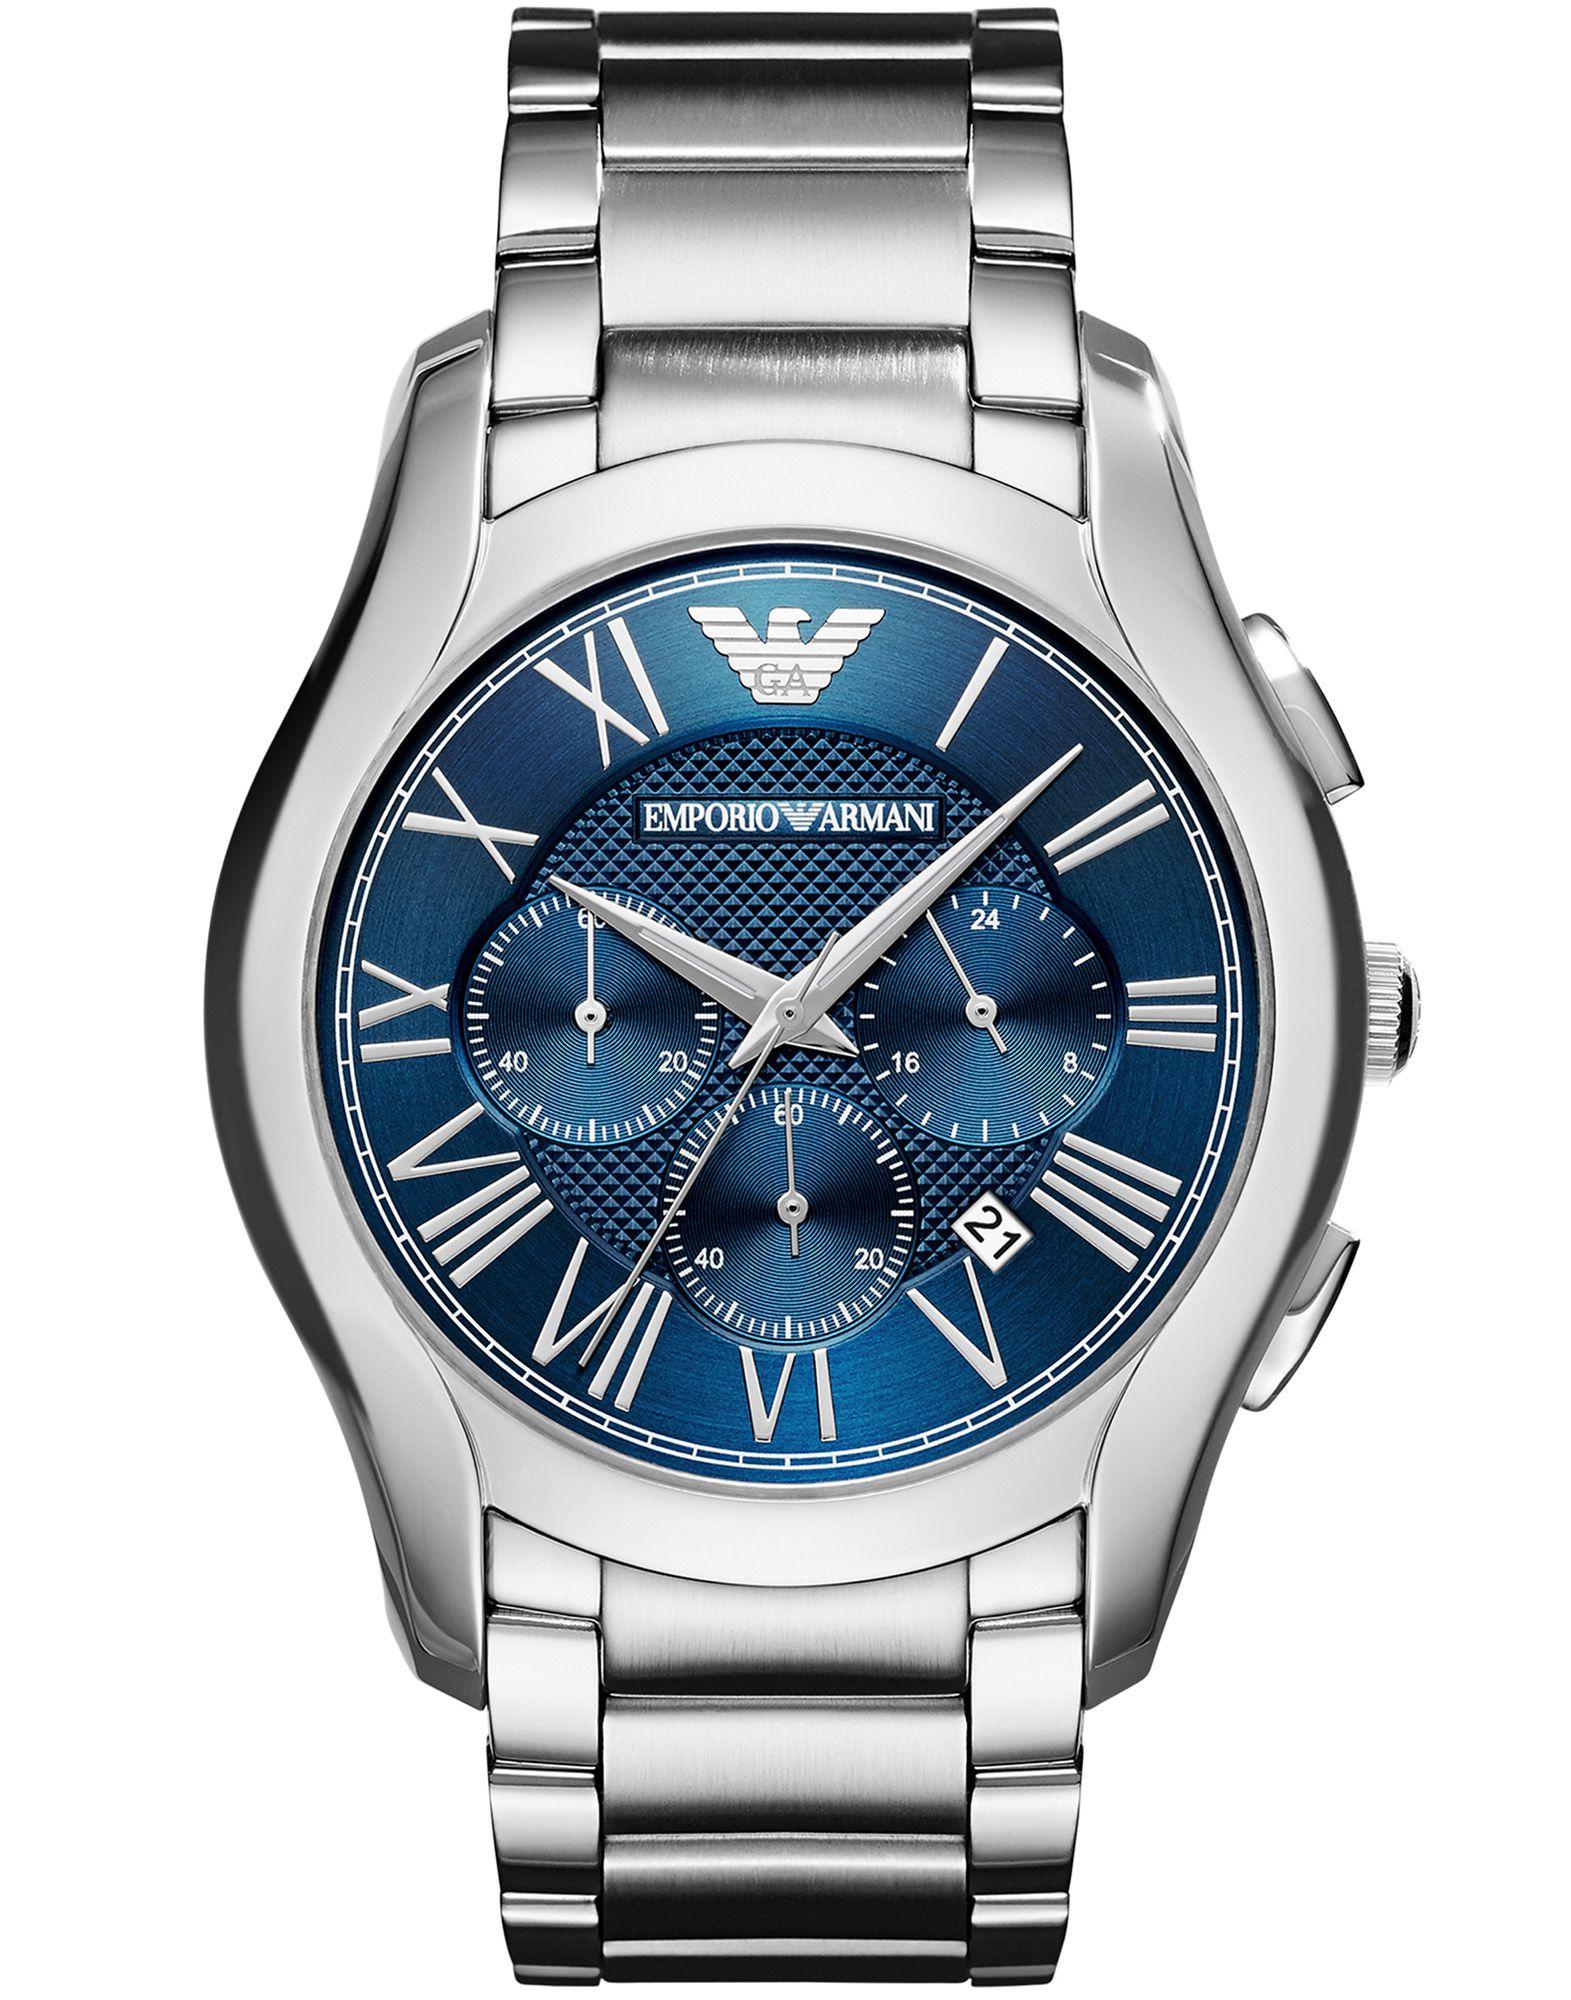 EMPORIO ARMANI Наручные часы